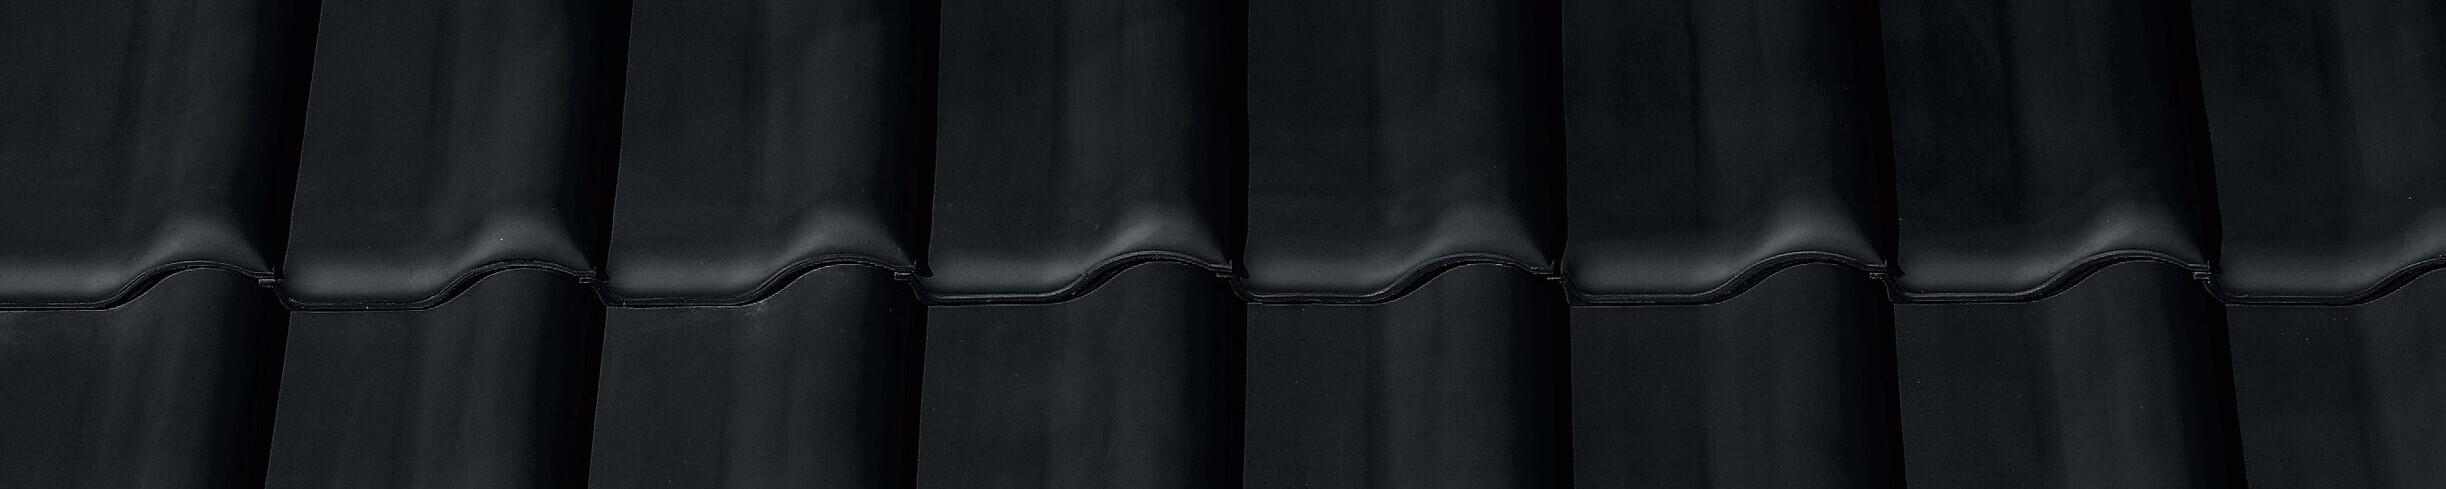 MZ3 NEU NUANCE schwarz matt engobiert